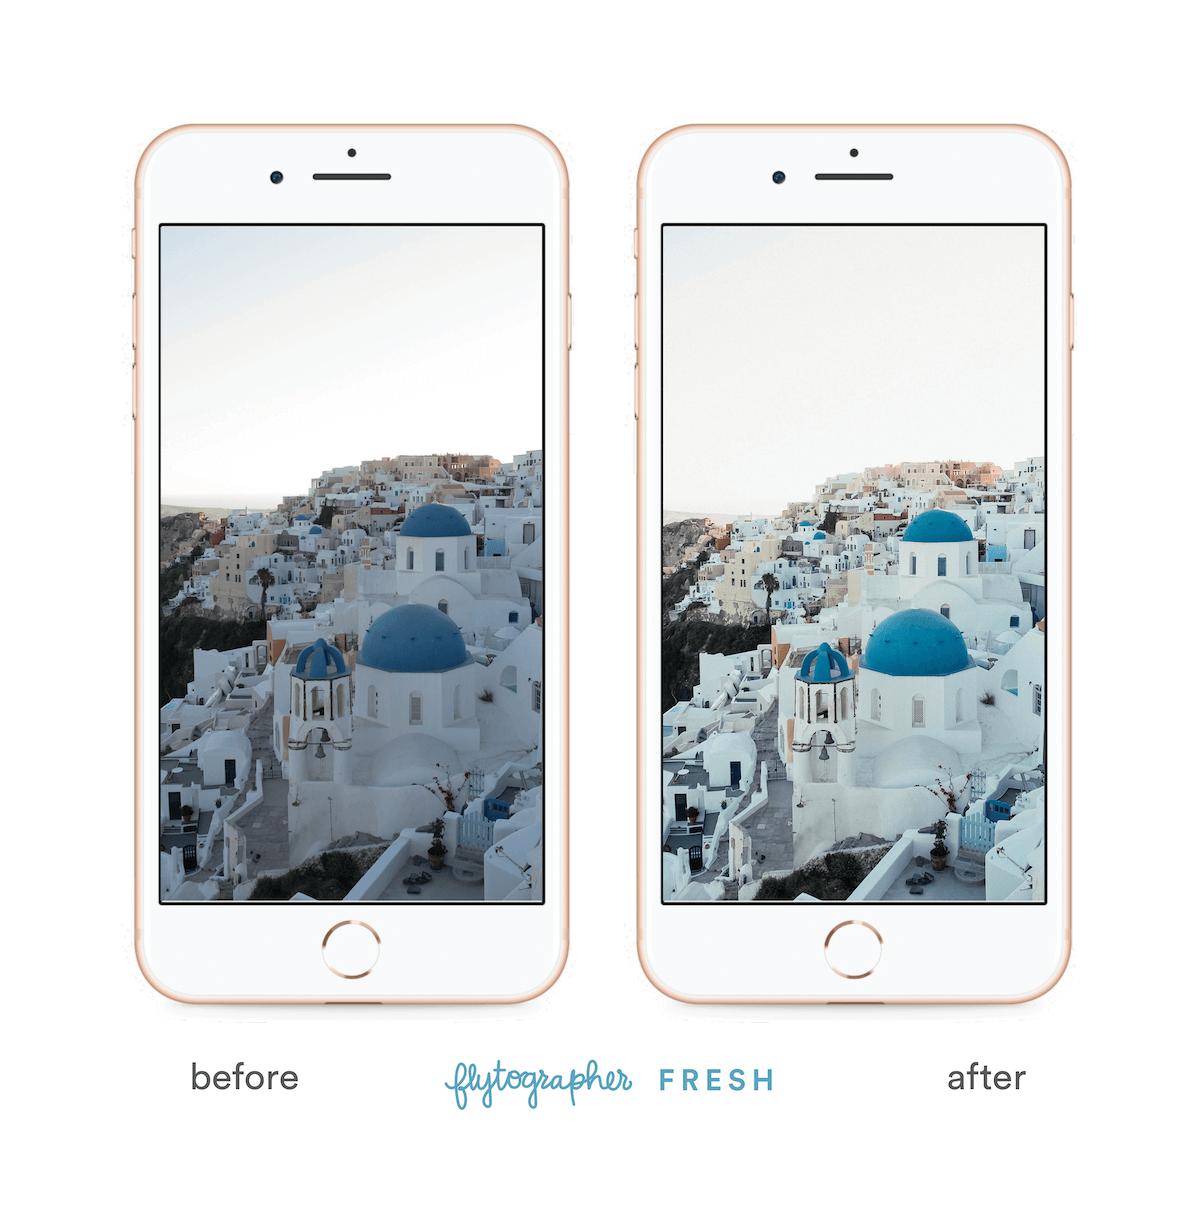 Santorini buildings before and after 'Flytographer Fresh' preset